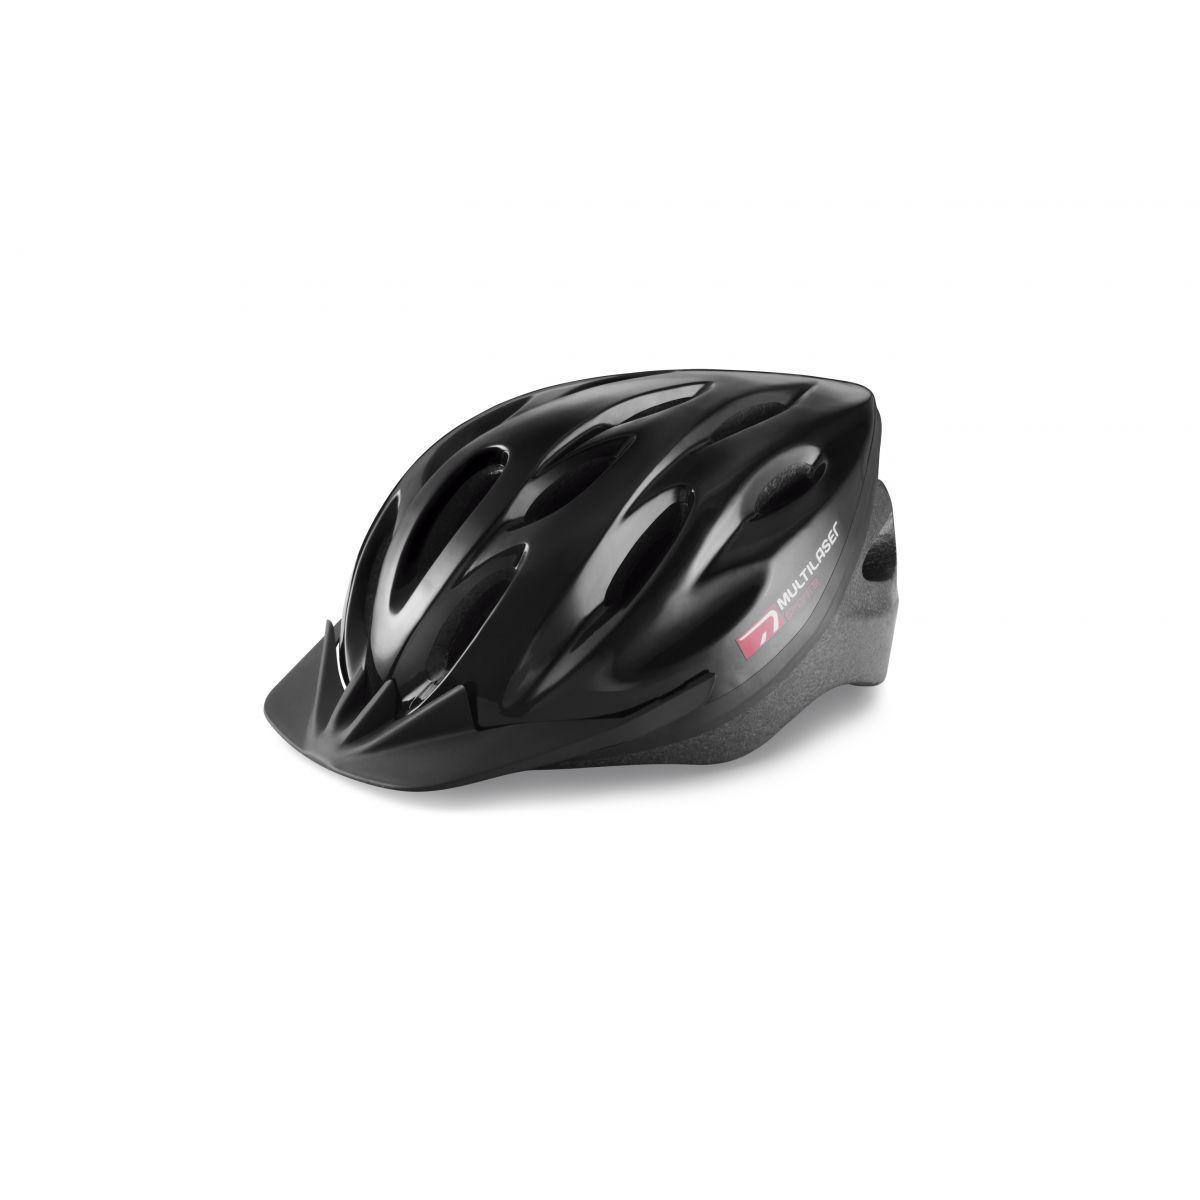 Capacete Ciclismo Tamanho G Multilaser Sports Bike Bi003